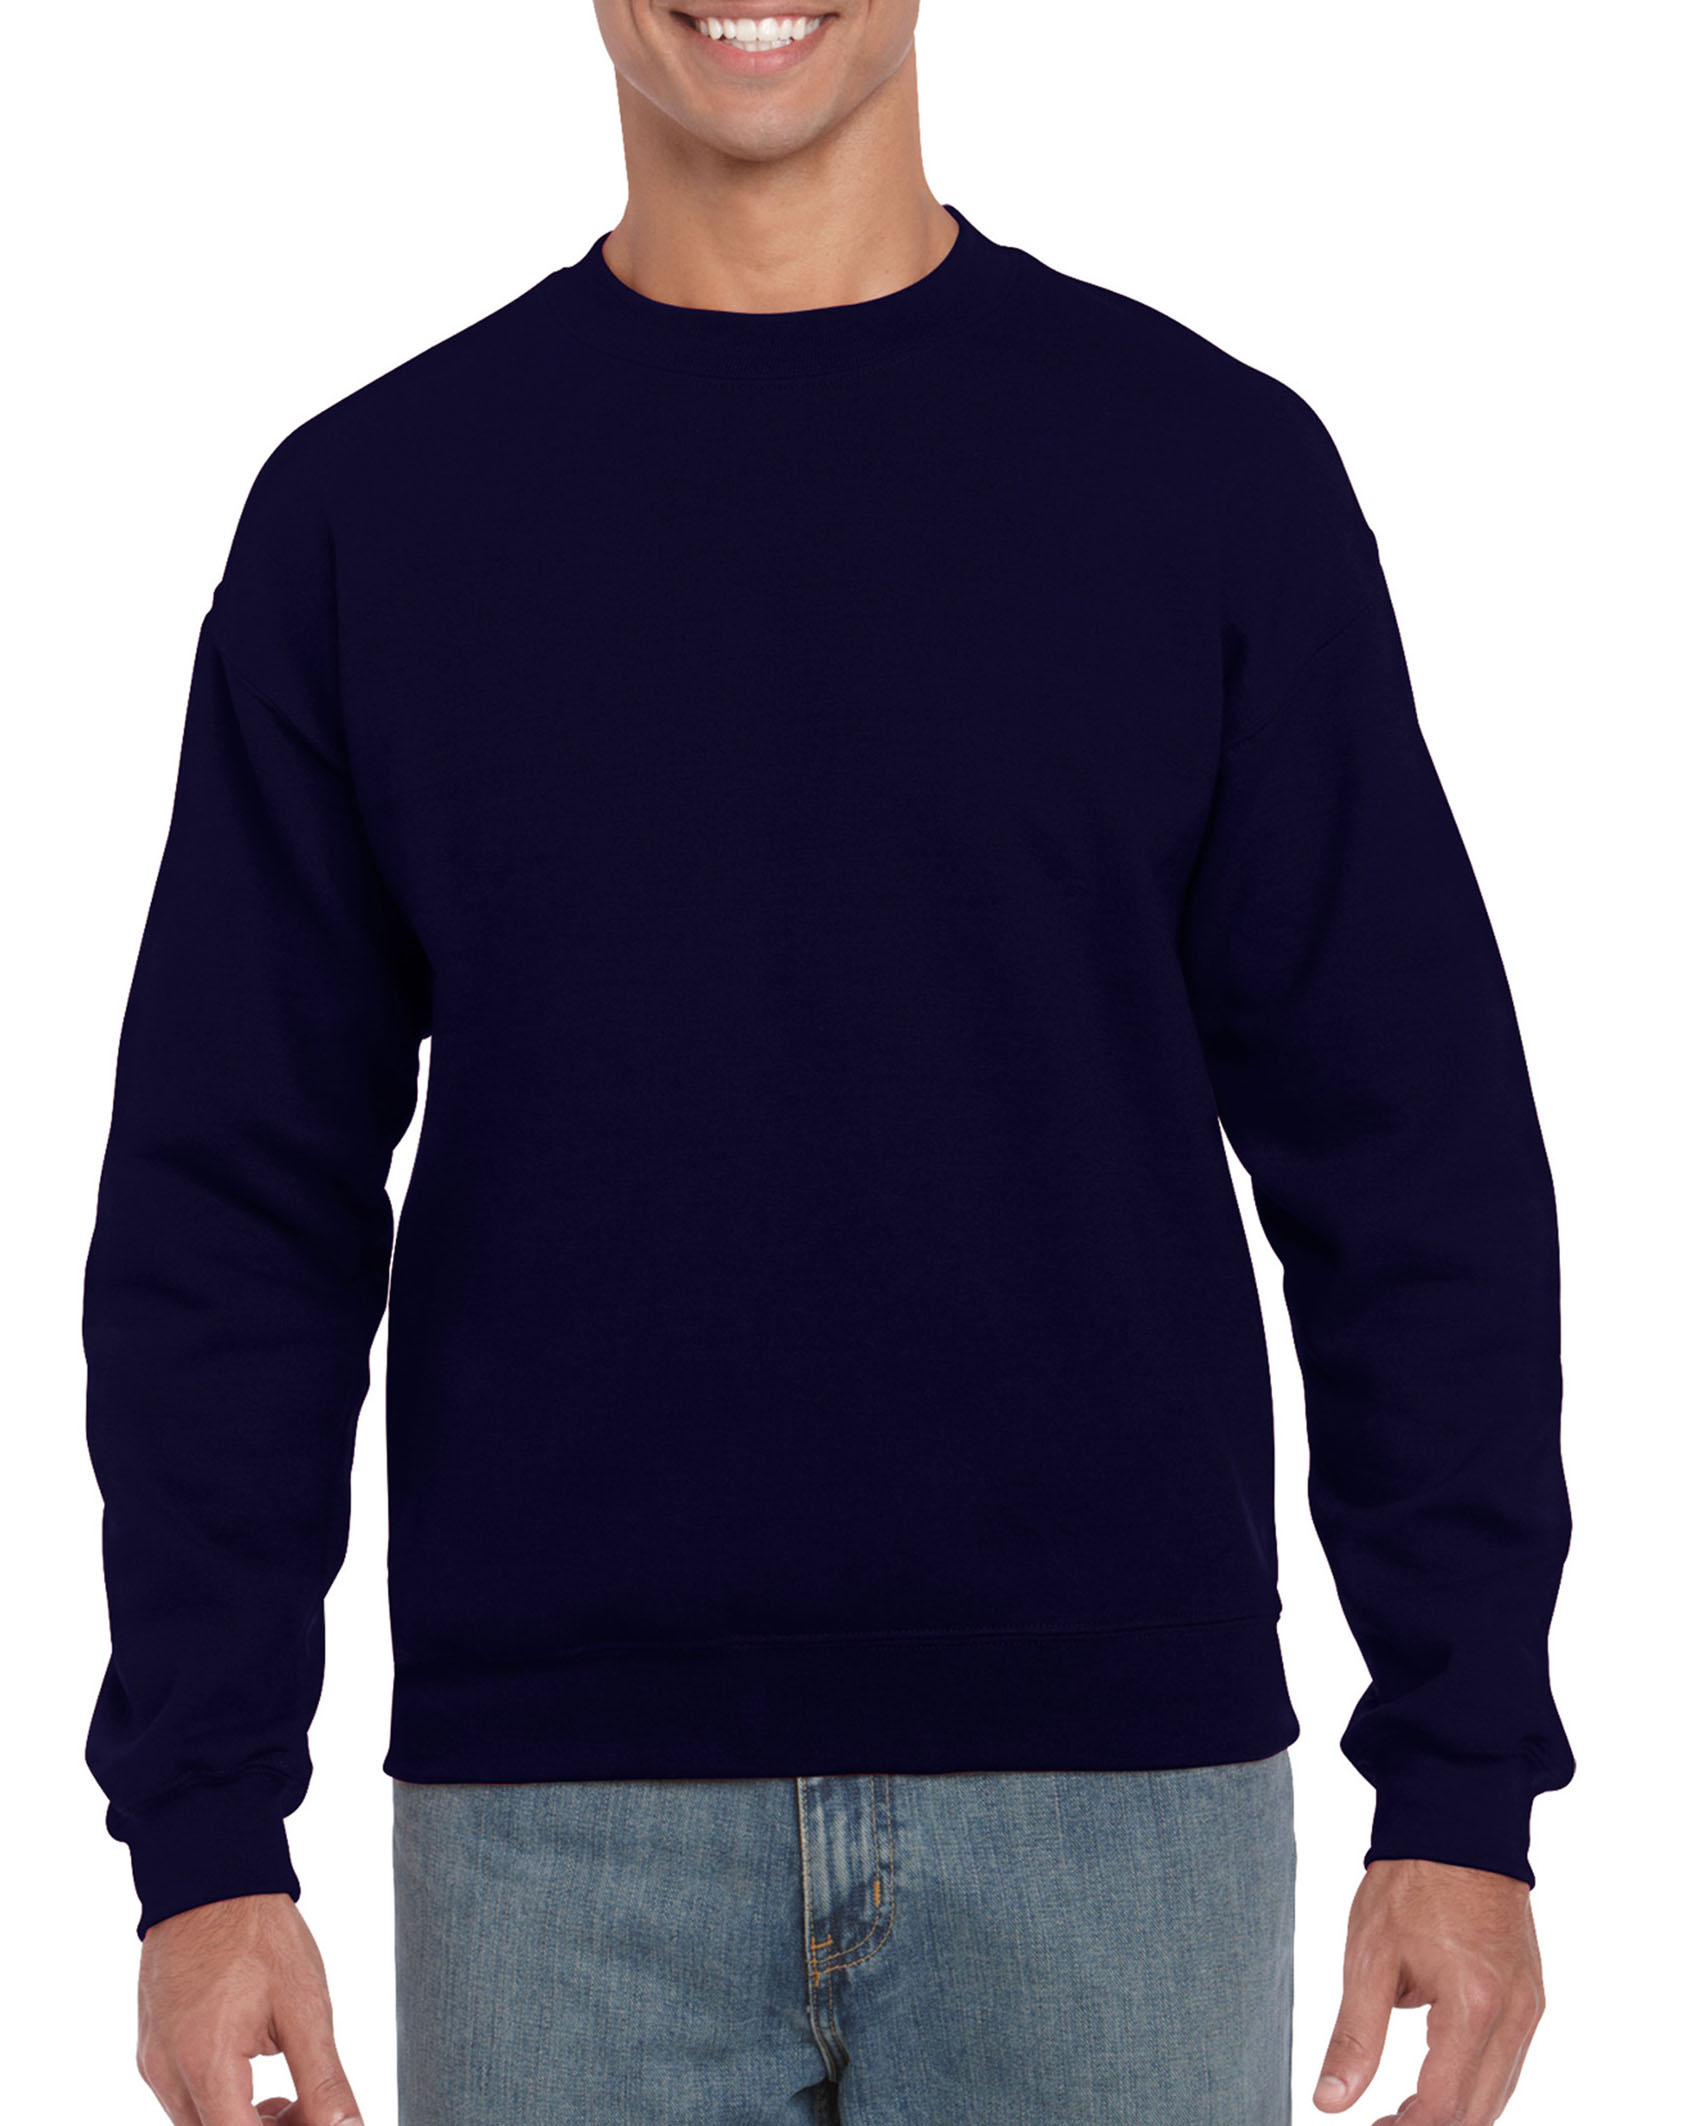 25St Gildan Sweater incl. 1k opdruk (Navy)